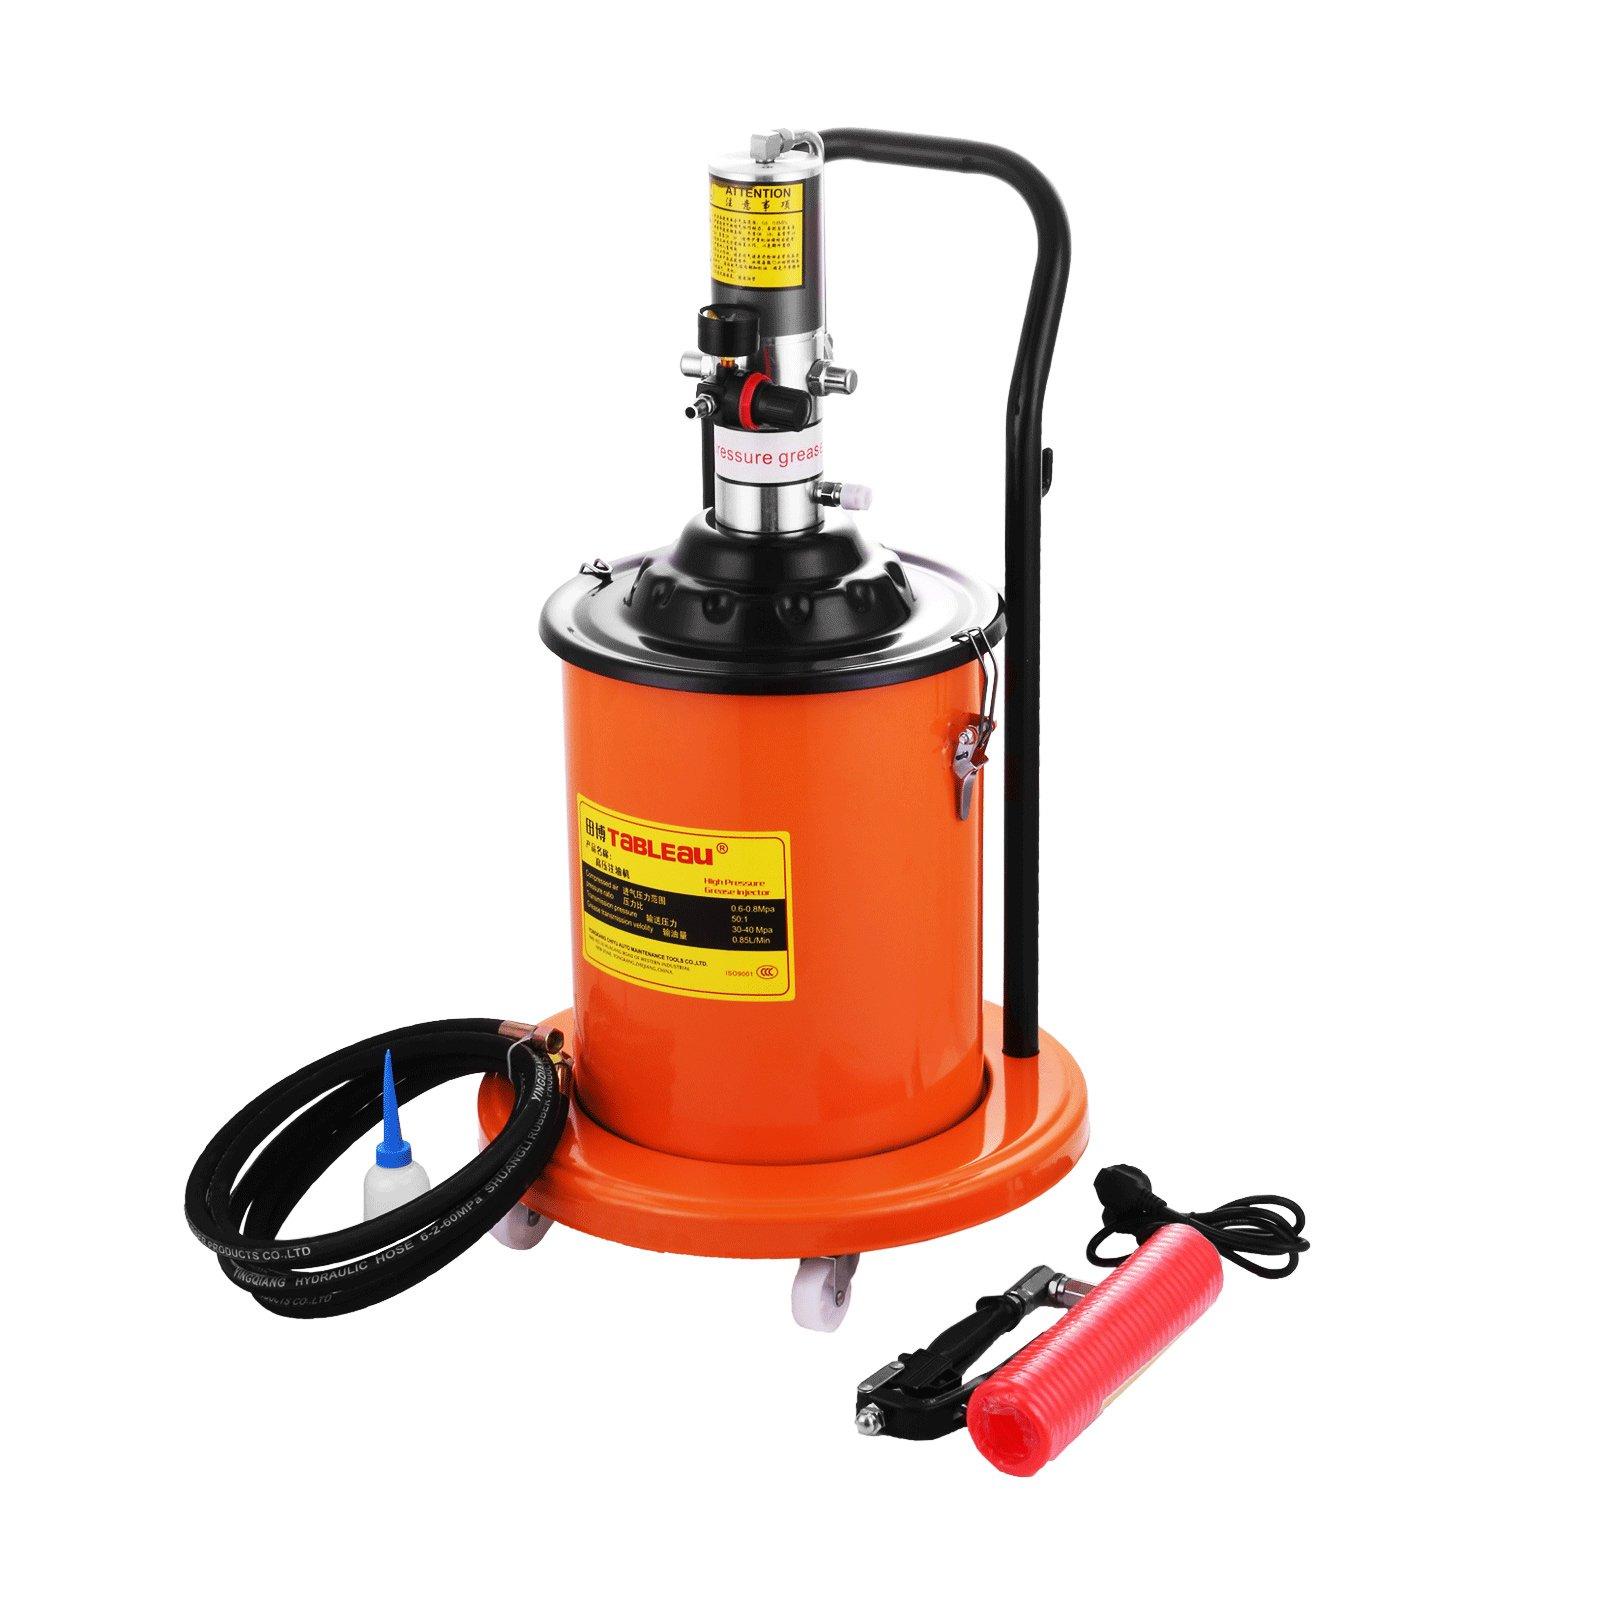 Mophorn Grease Pump 0.85L/Min Electric Grease Pump 20L Grease Pump 5 Gallon Air Operated High-Pressure Grease Pump(20L)